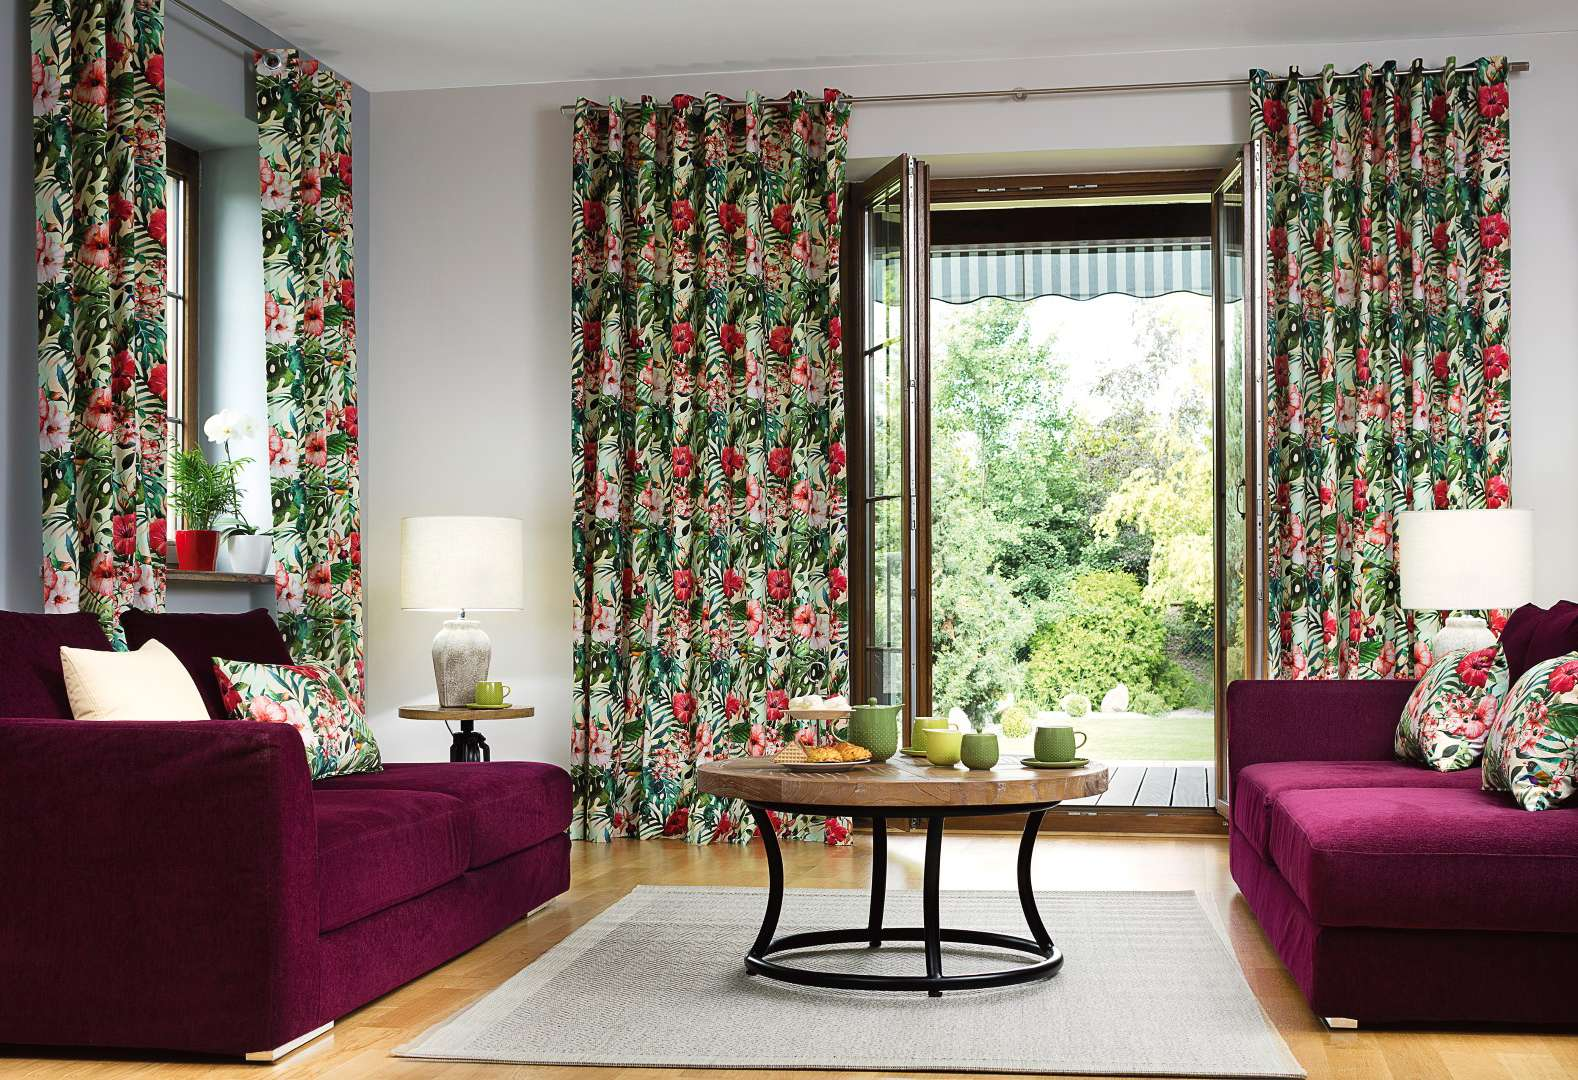 Dzsungel a nappaliban - New Art